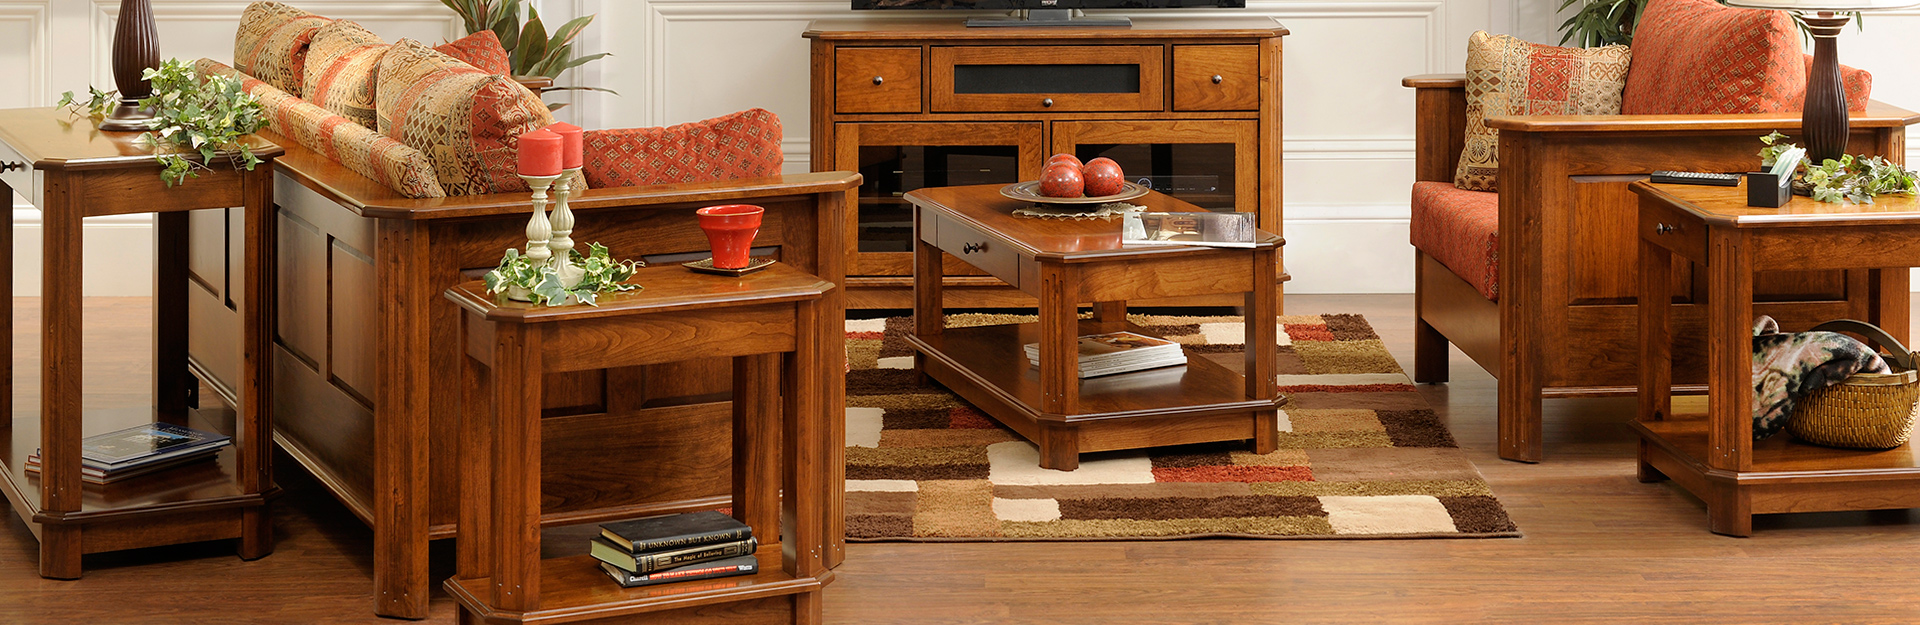 amish built sofa tables bed basel living occational usa furnitureoak furniture warehouse